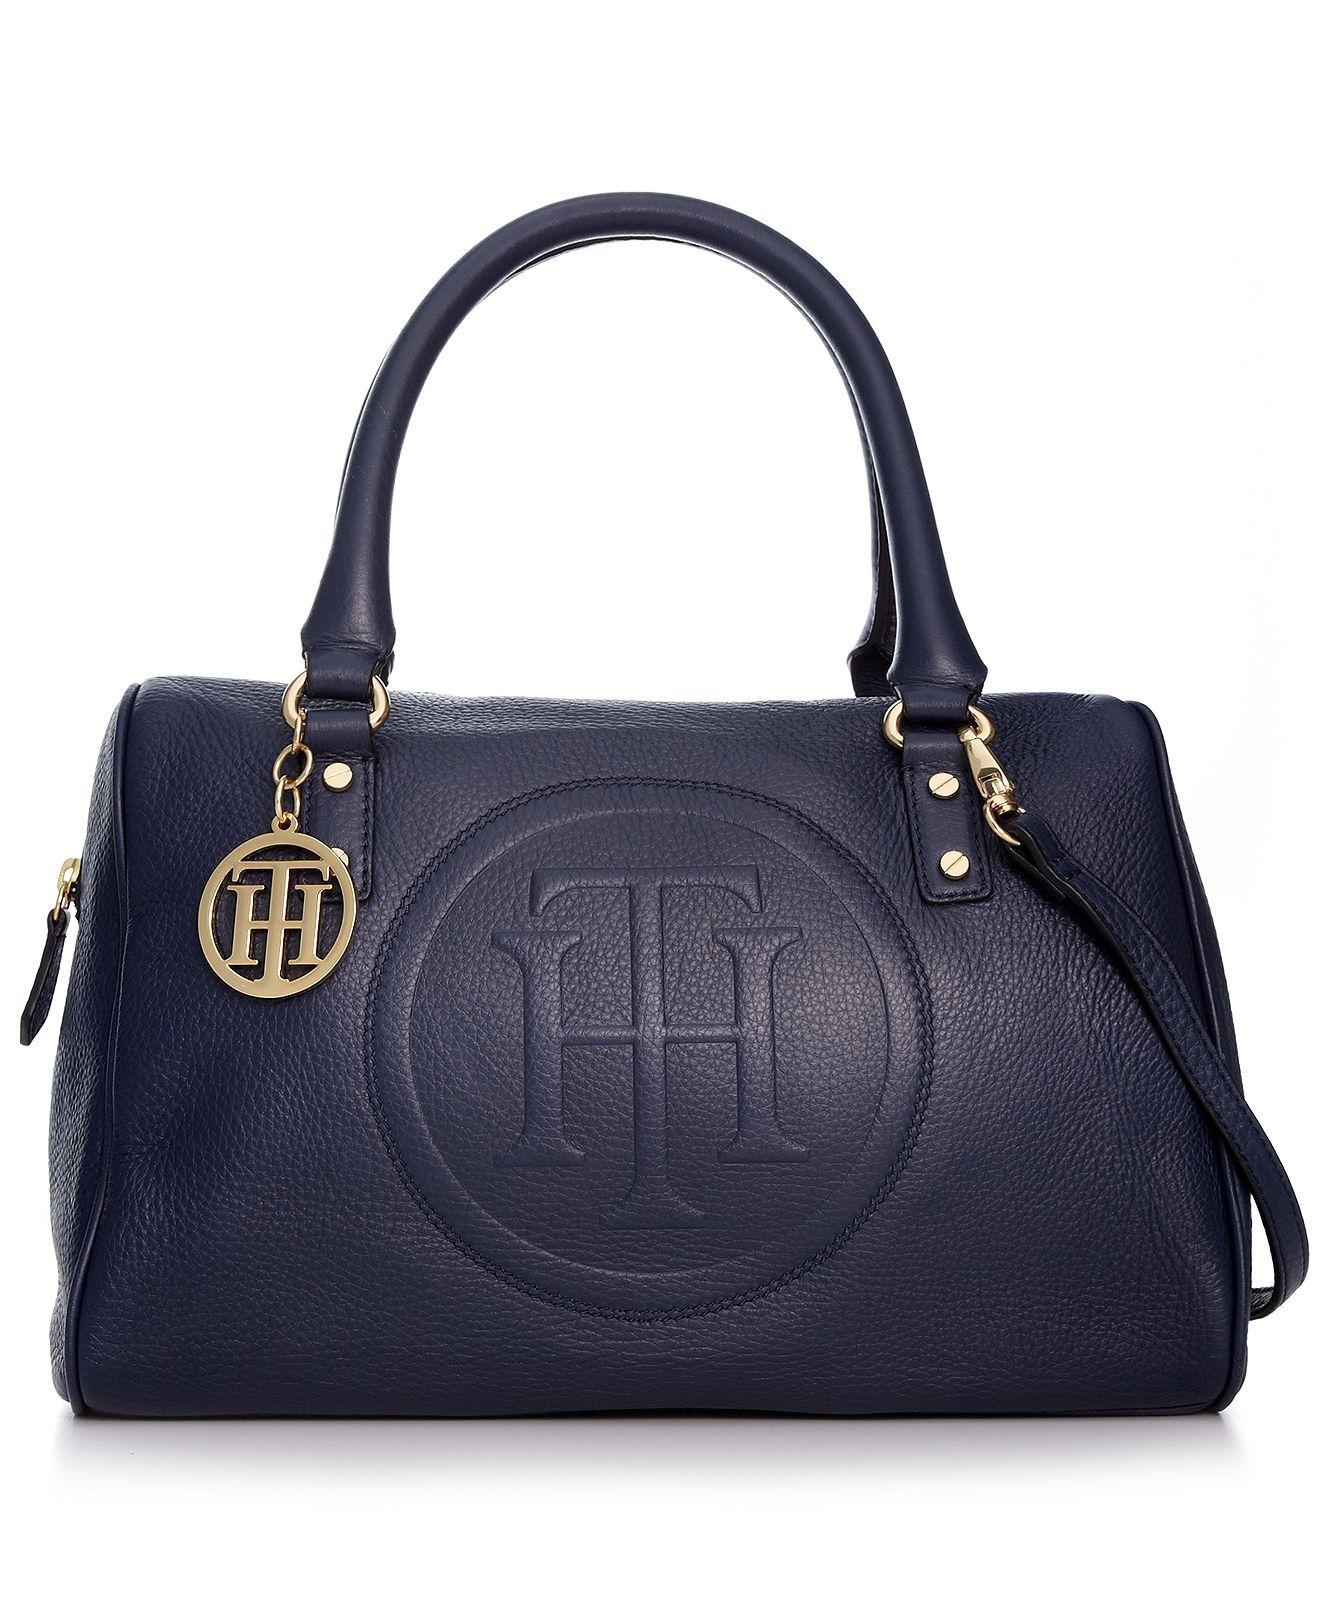 198 - Tommy Hilfiger Handbag   Handbags   Pinterest   Tommy ... 1feb953a0f